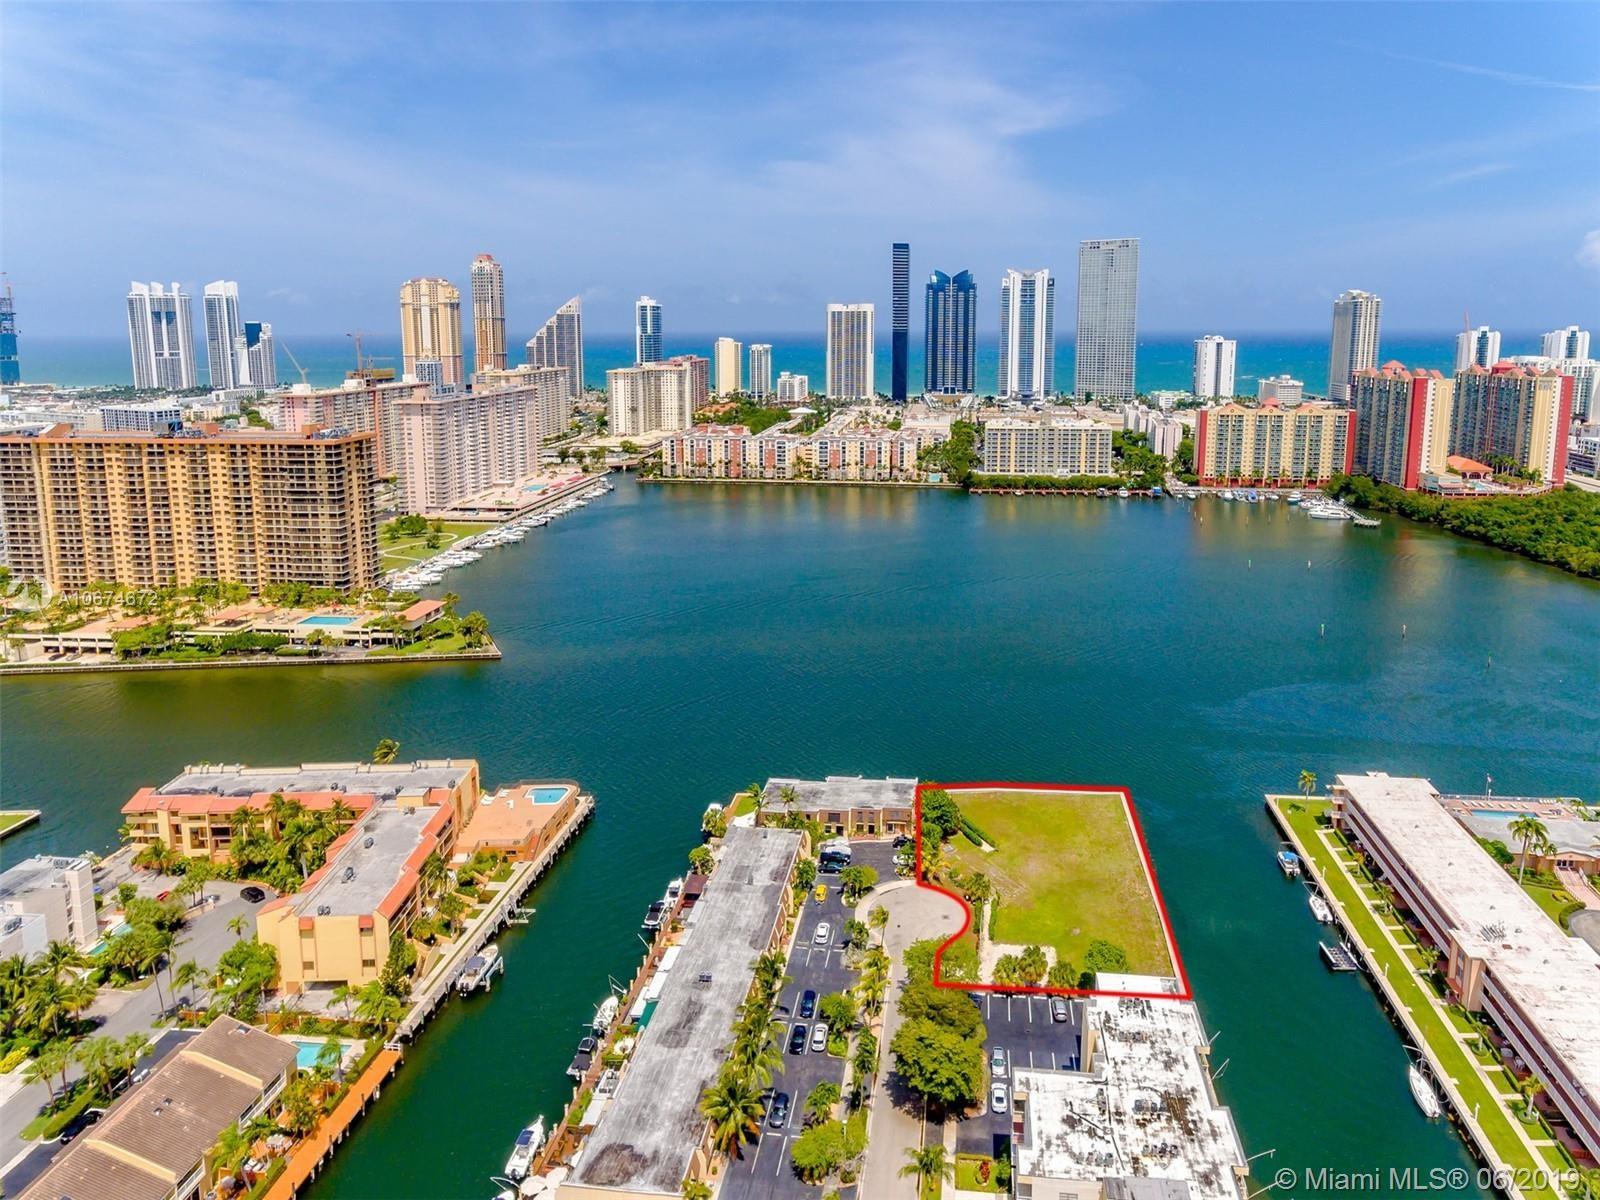 4098 NE 167 ST, North Miami Beach, FL 33160